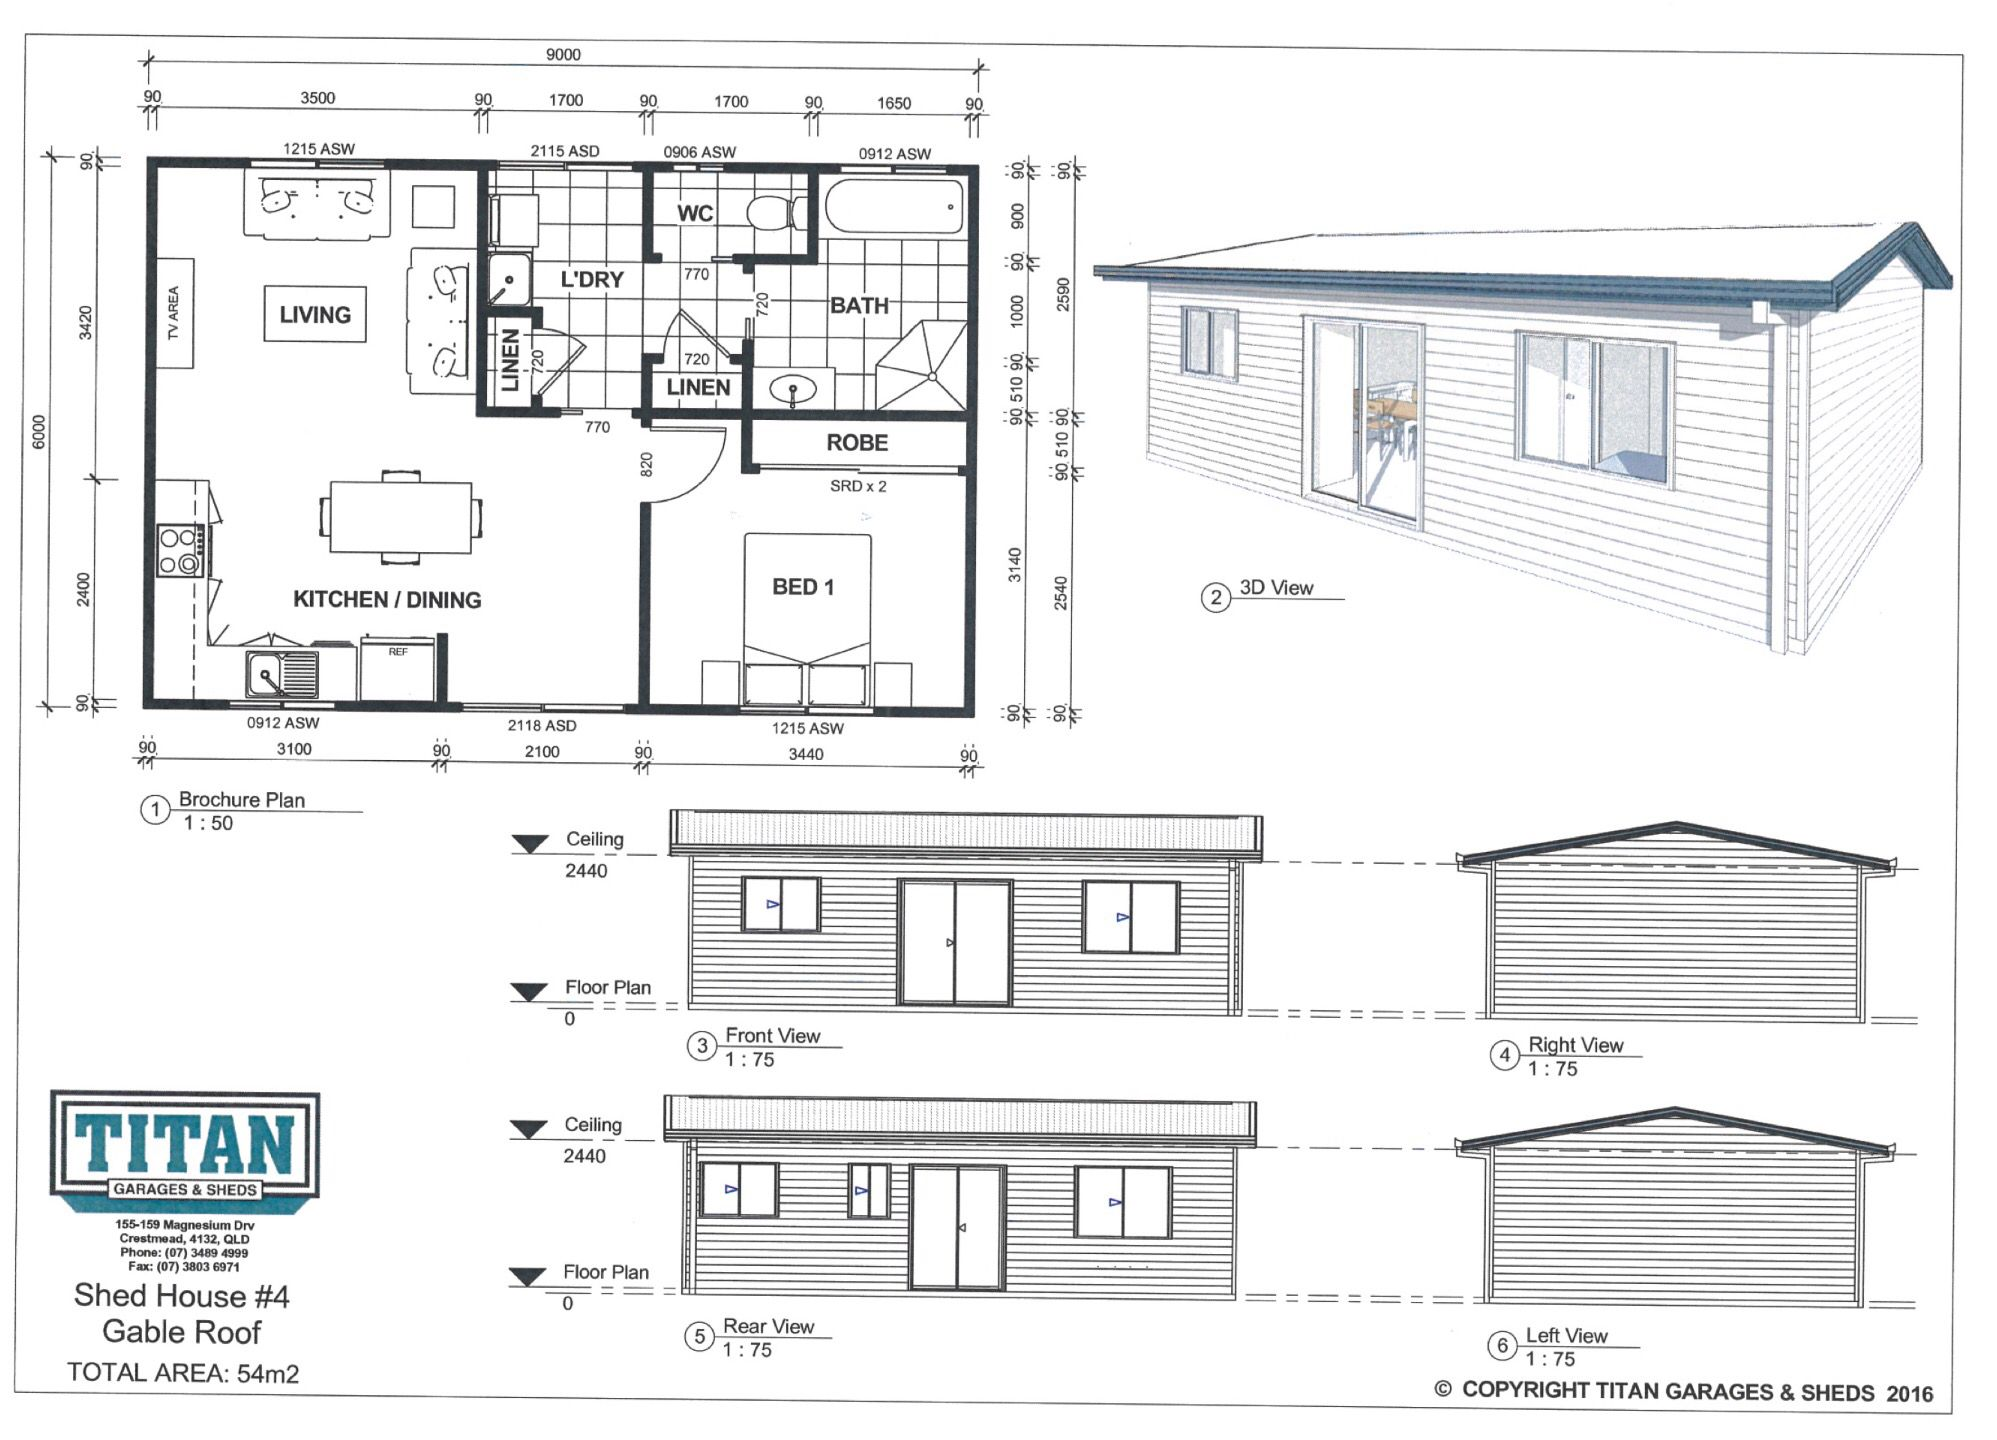 Titan Homes 4 Gable Roof 54m2